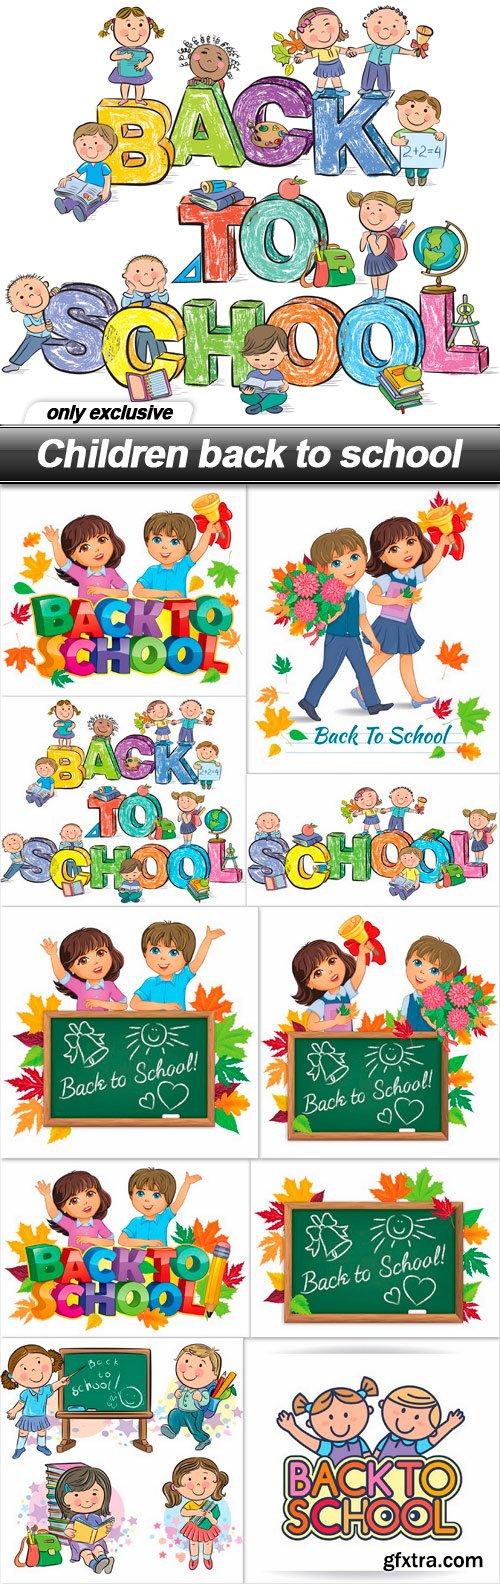 Children back to school - 10 EPS